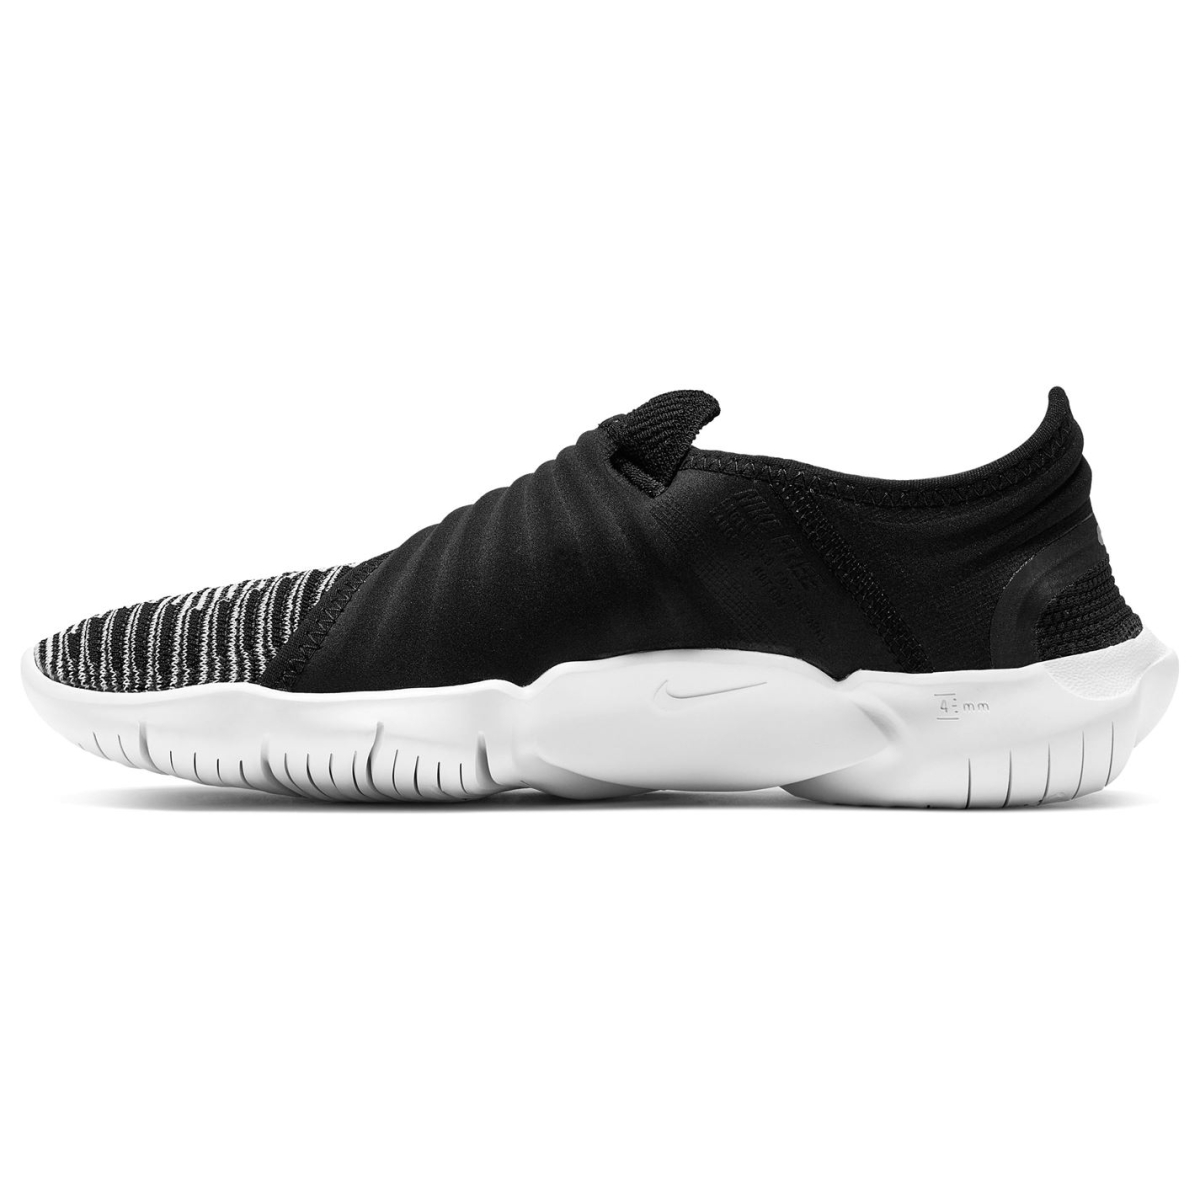 Nike-Free-Run-Flyknit-3-0-Turnschuhe-Damen-Sneaker-Sportschuhe-Laufschuhe-4450 Indexbild 4